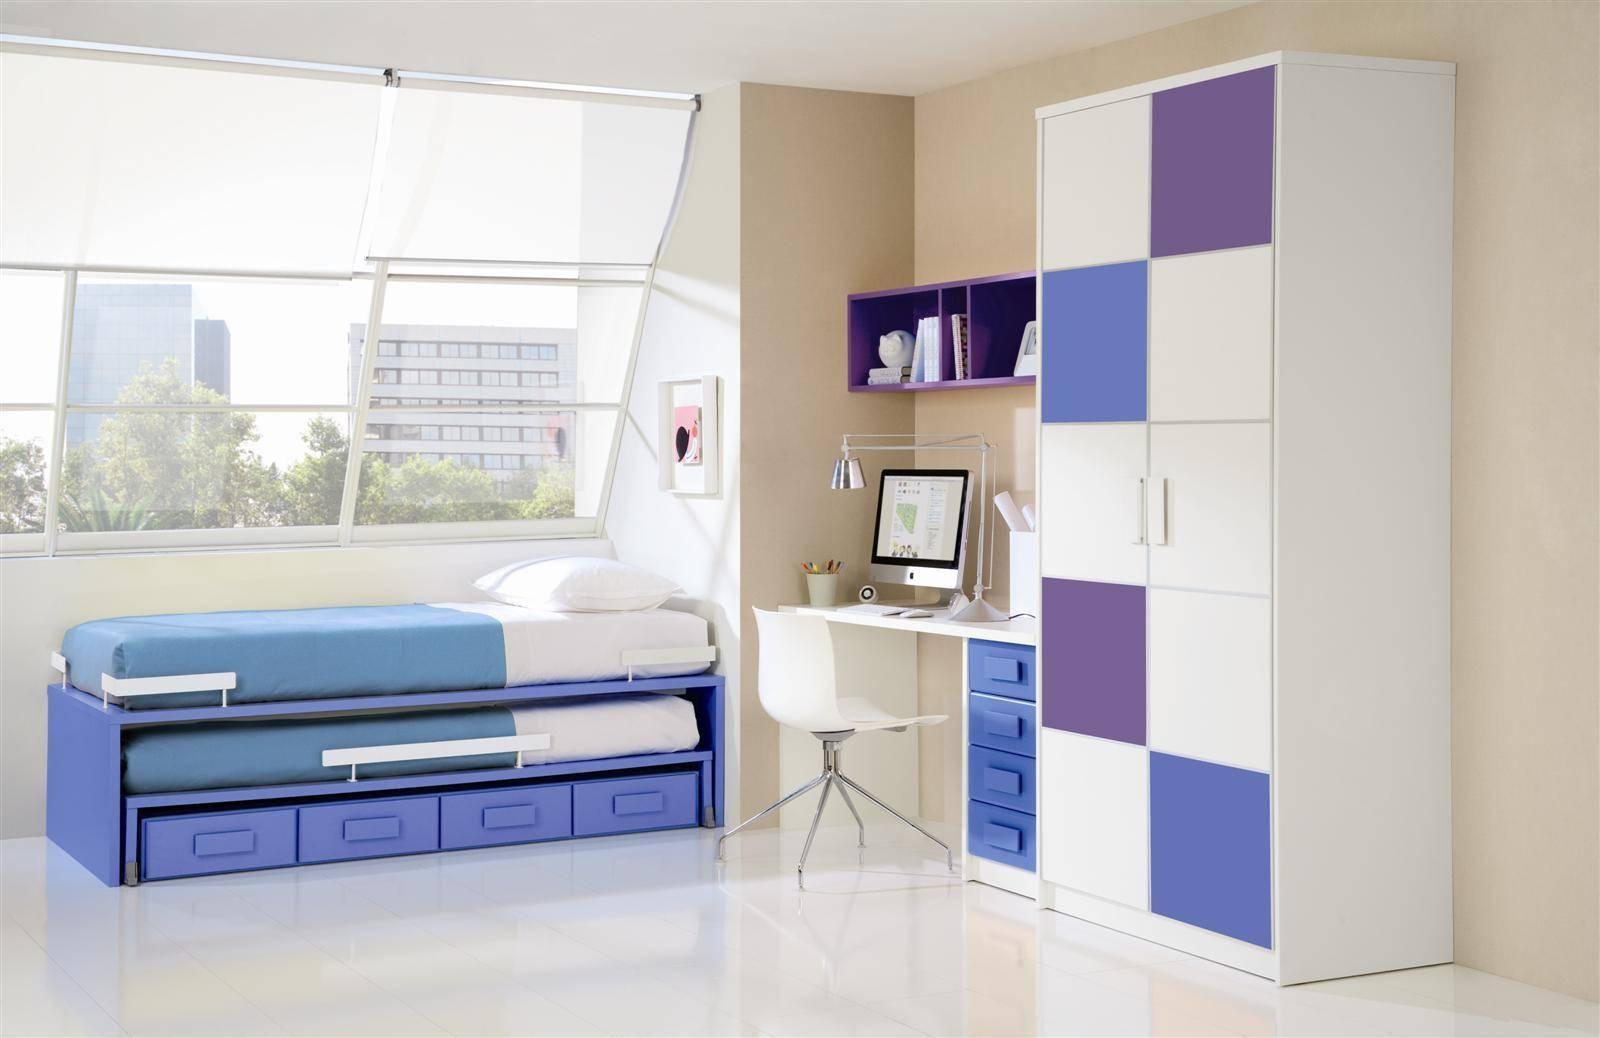 Download Wardrobe For Kids Bedroom | Home Intercine regarding Childrens Bedroom Wardrobes (Image 23 of 30)